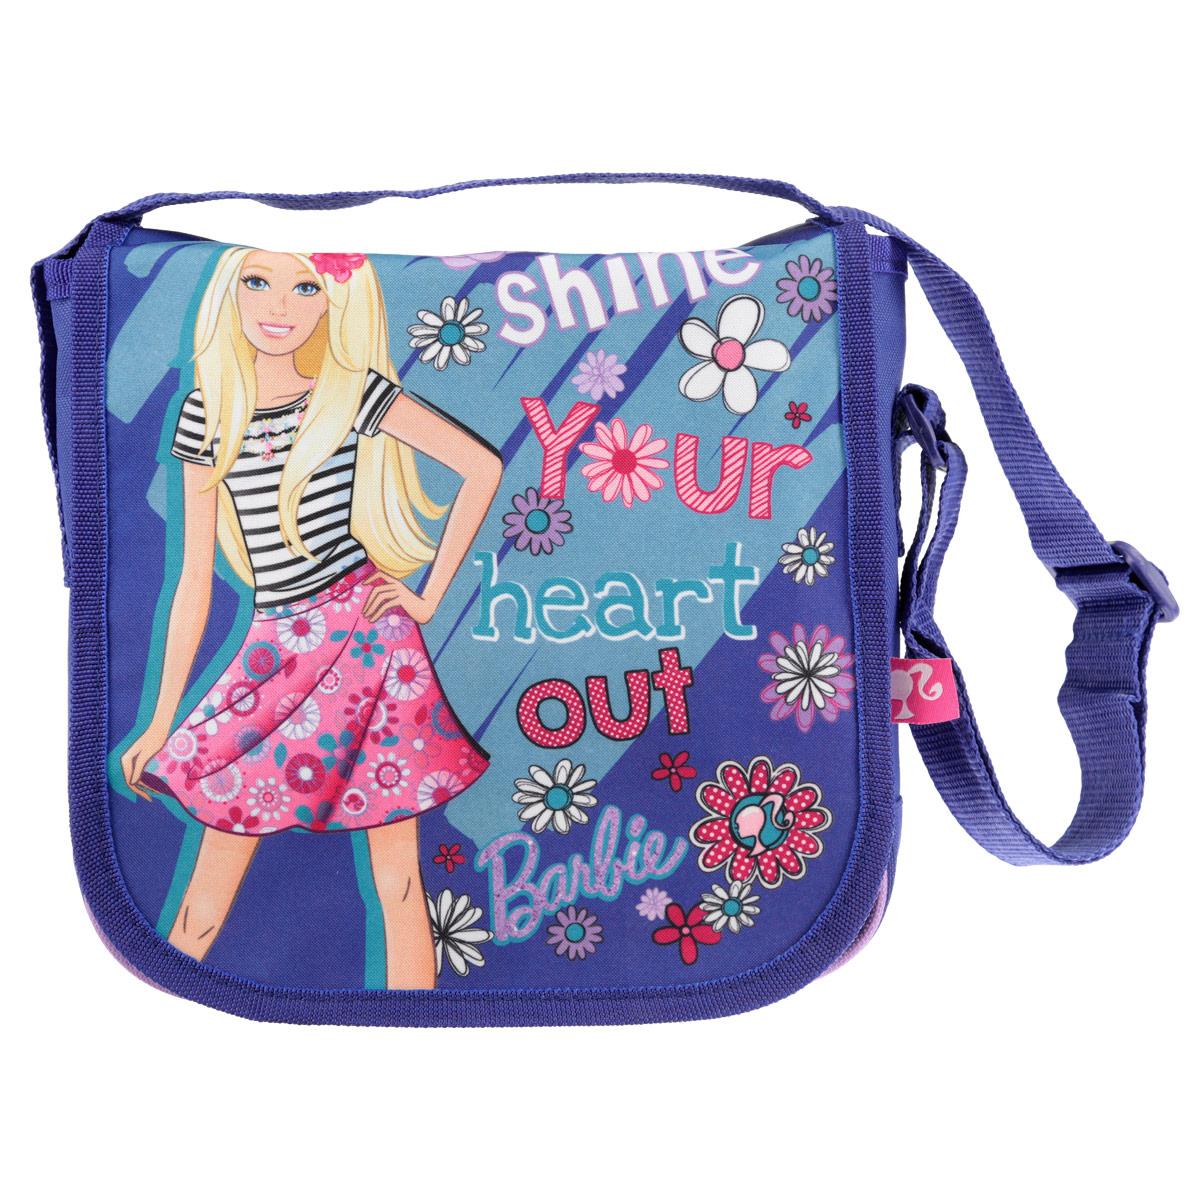 "Сумочка детская ""Barbie"", цвет: фиолетовый BRCB-UT4-4022"